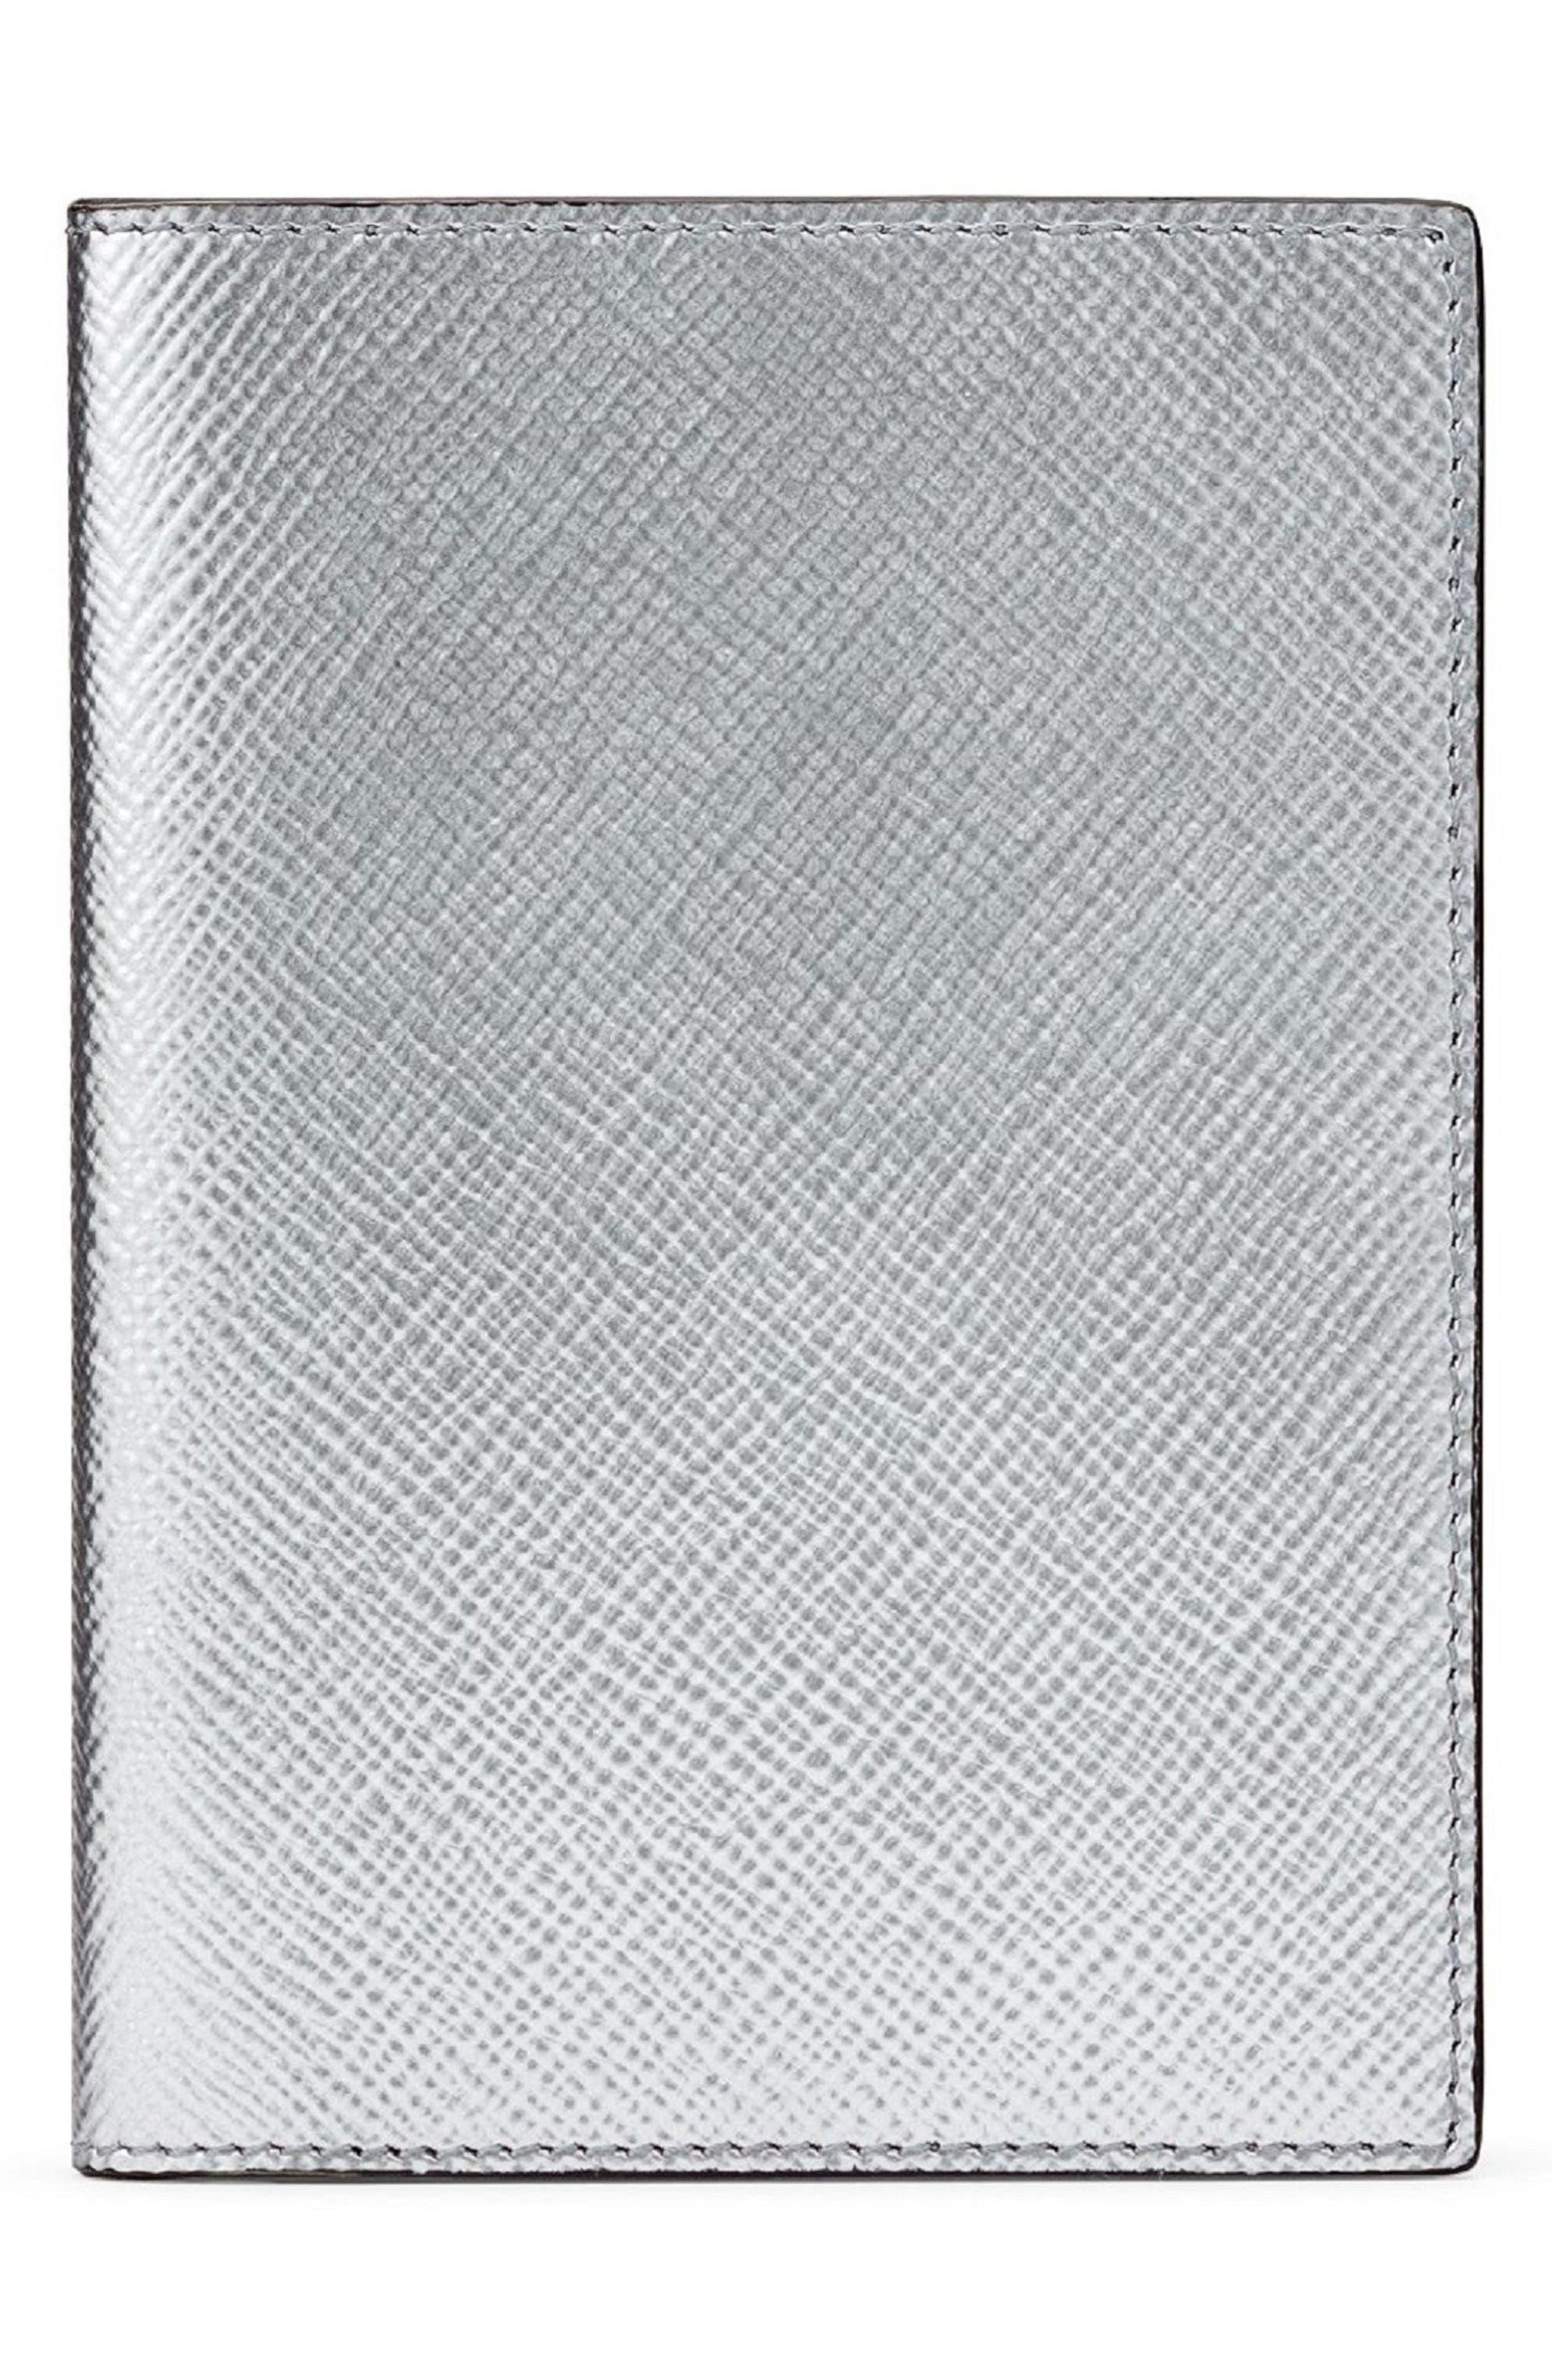 Panama Calfskin Leather Passport Case,                             Main thumbnail 1, color,